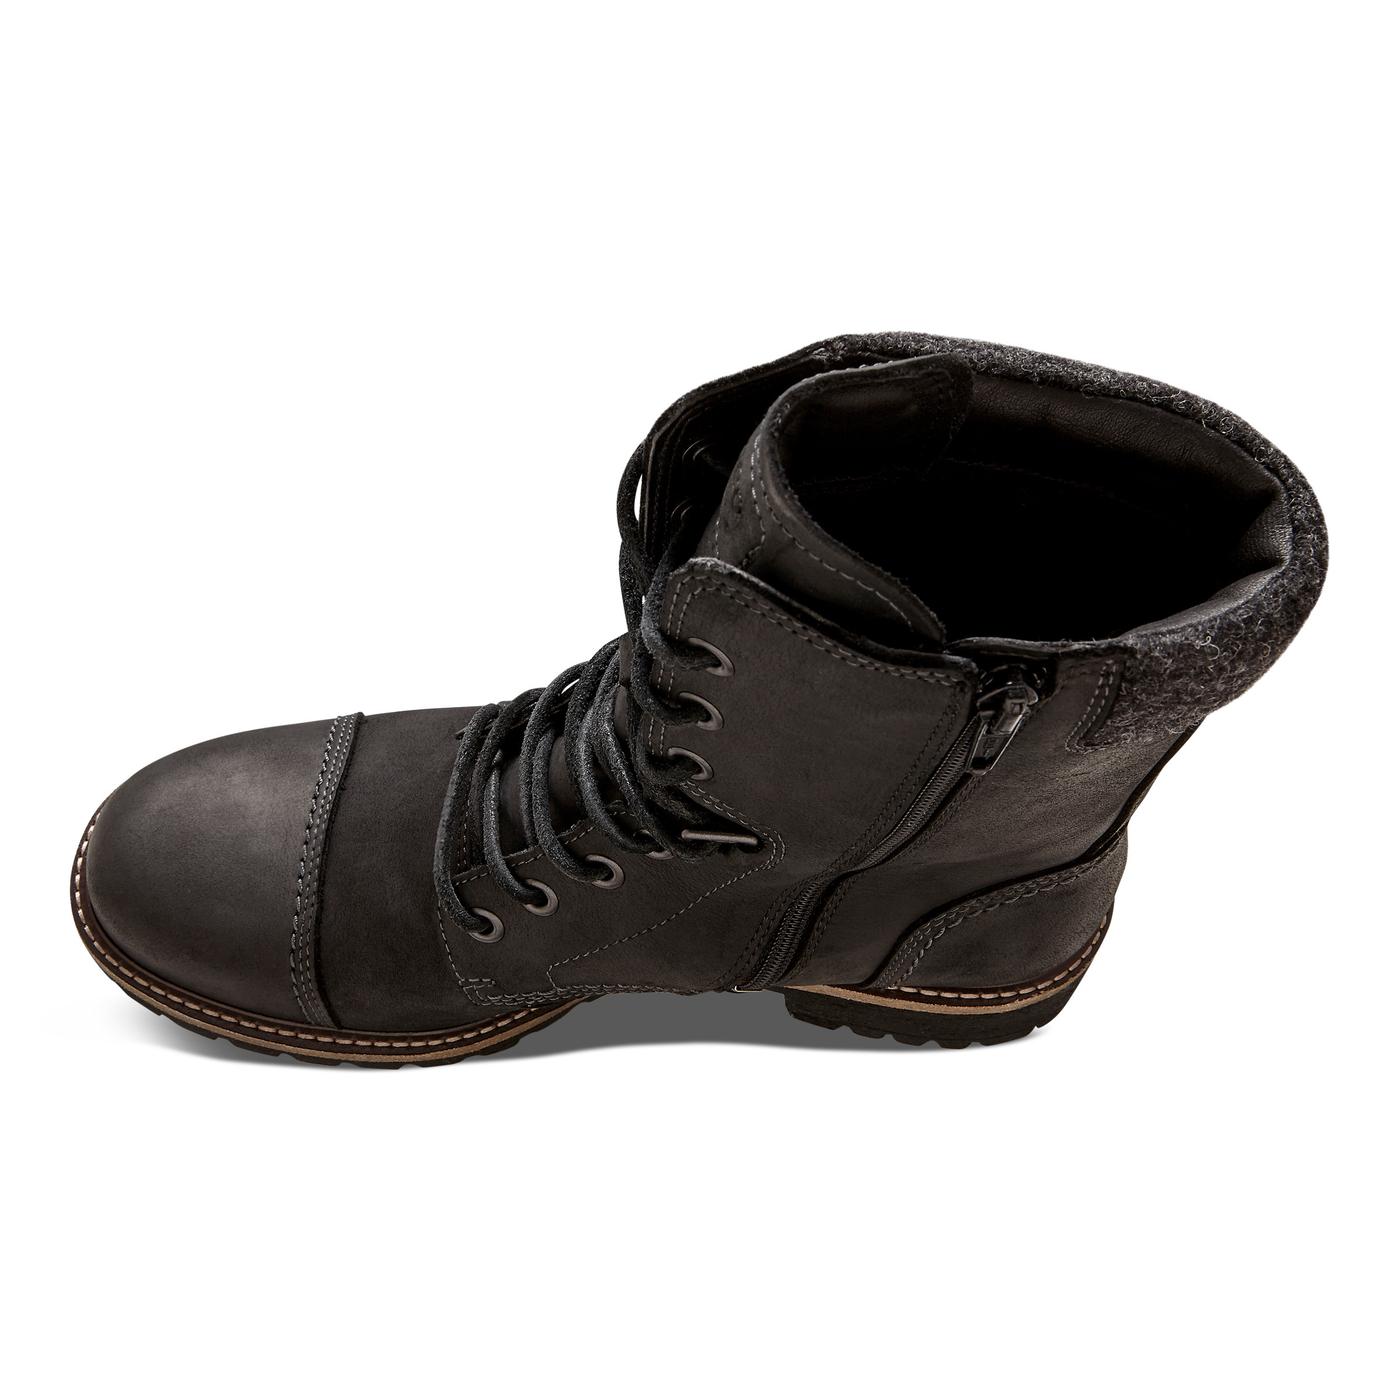 ECCO Elaine Work Boot HM